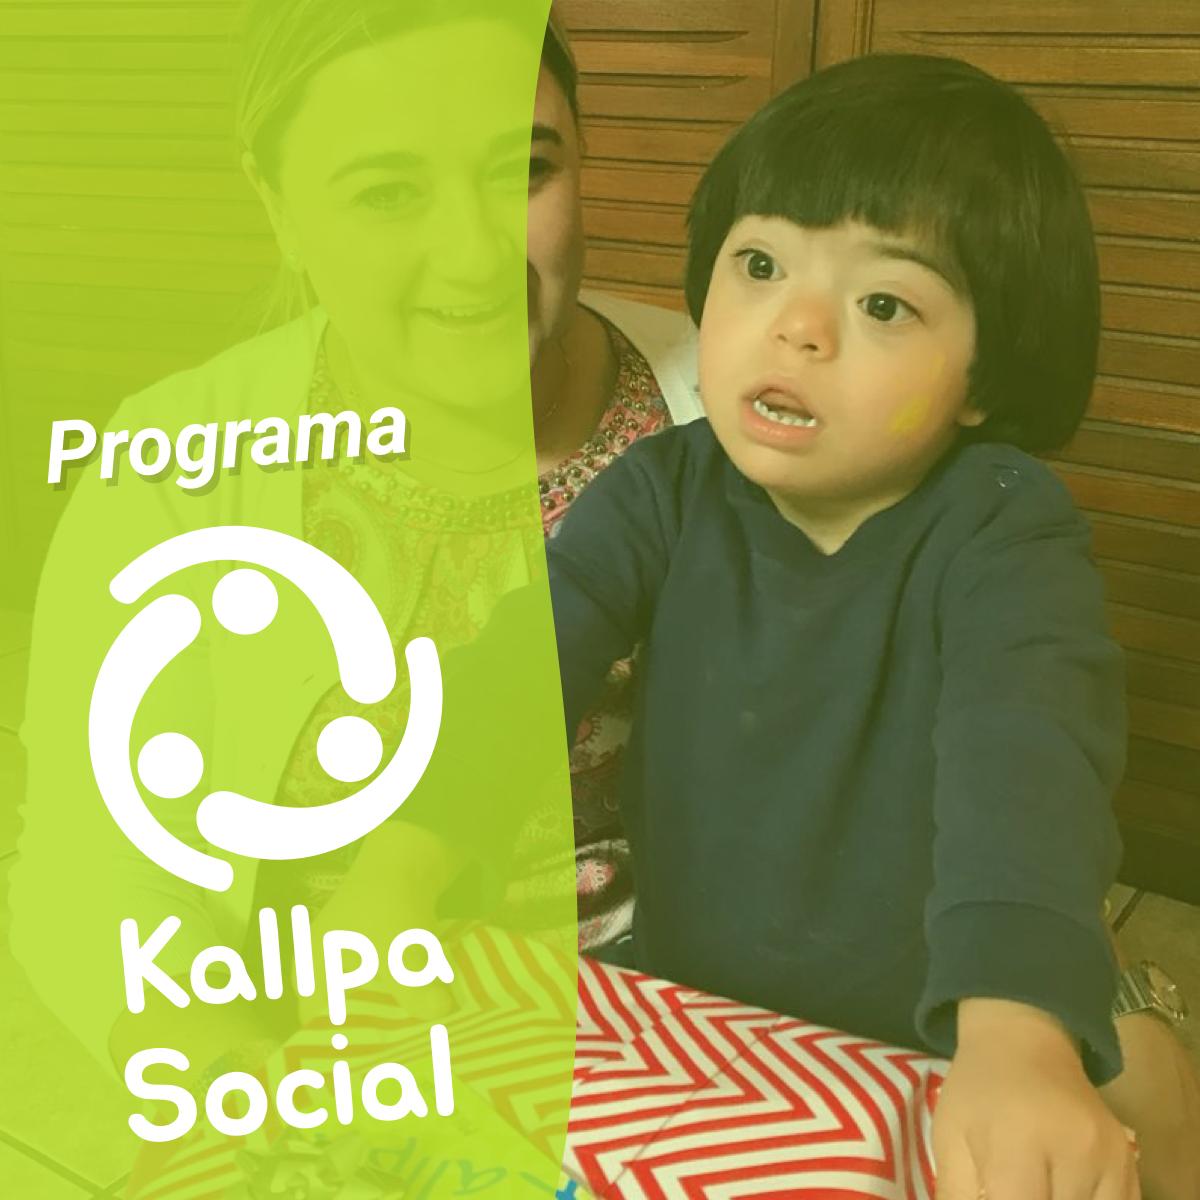 programa kallpa social 3.png